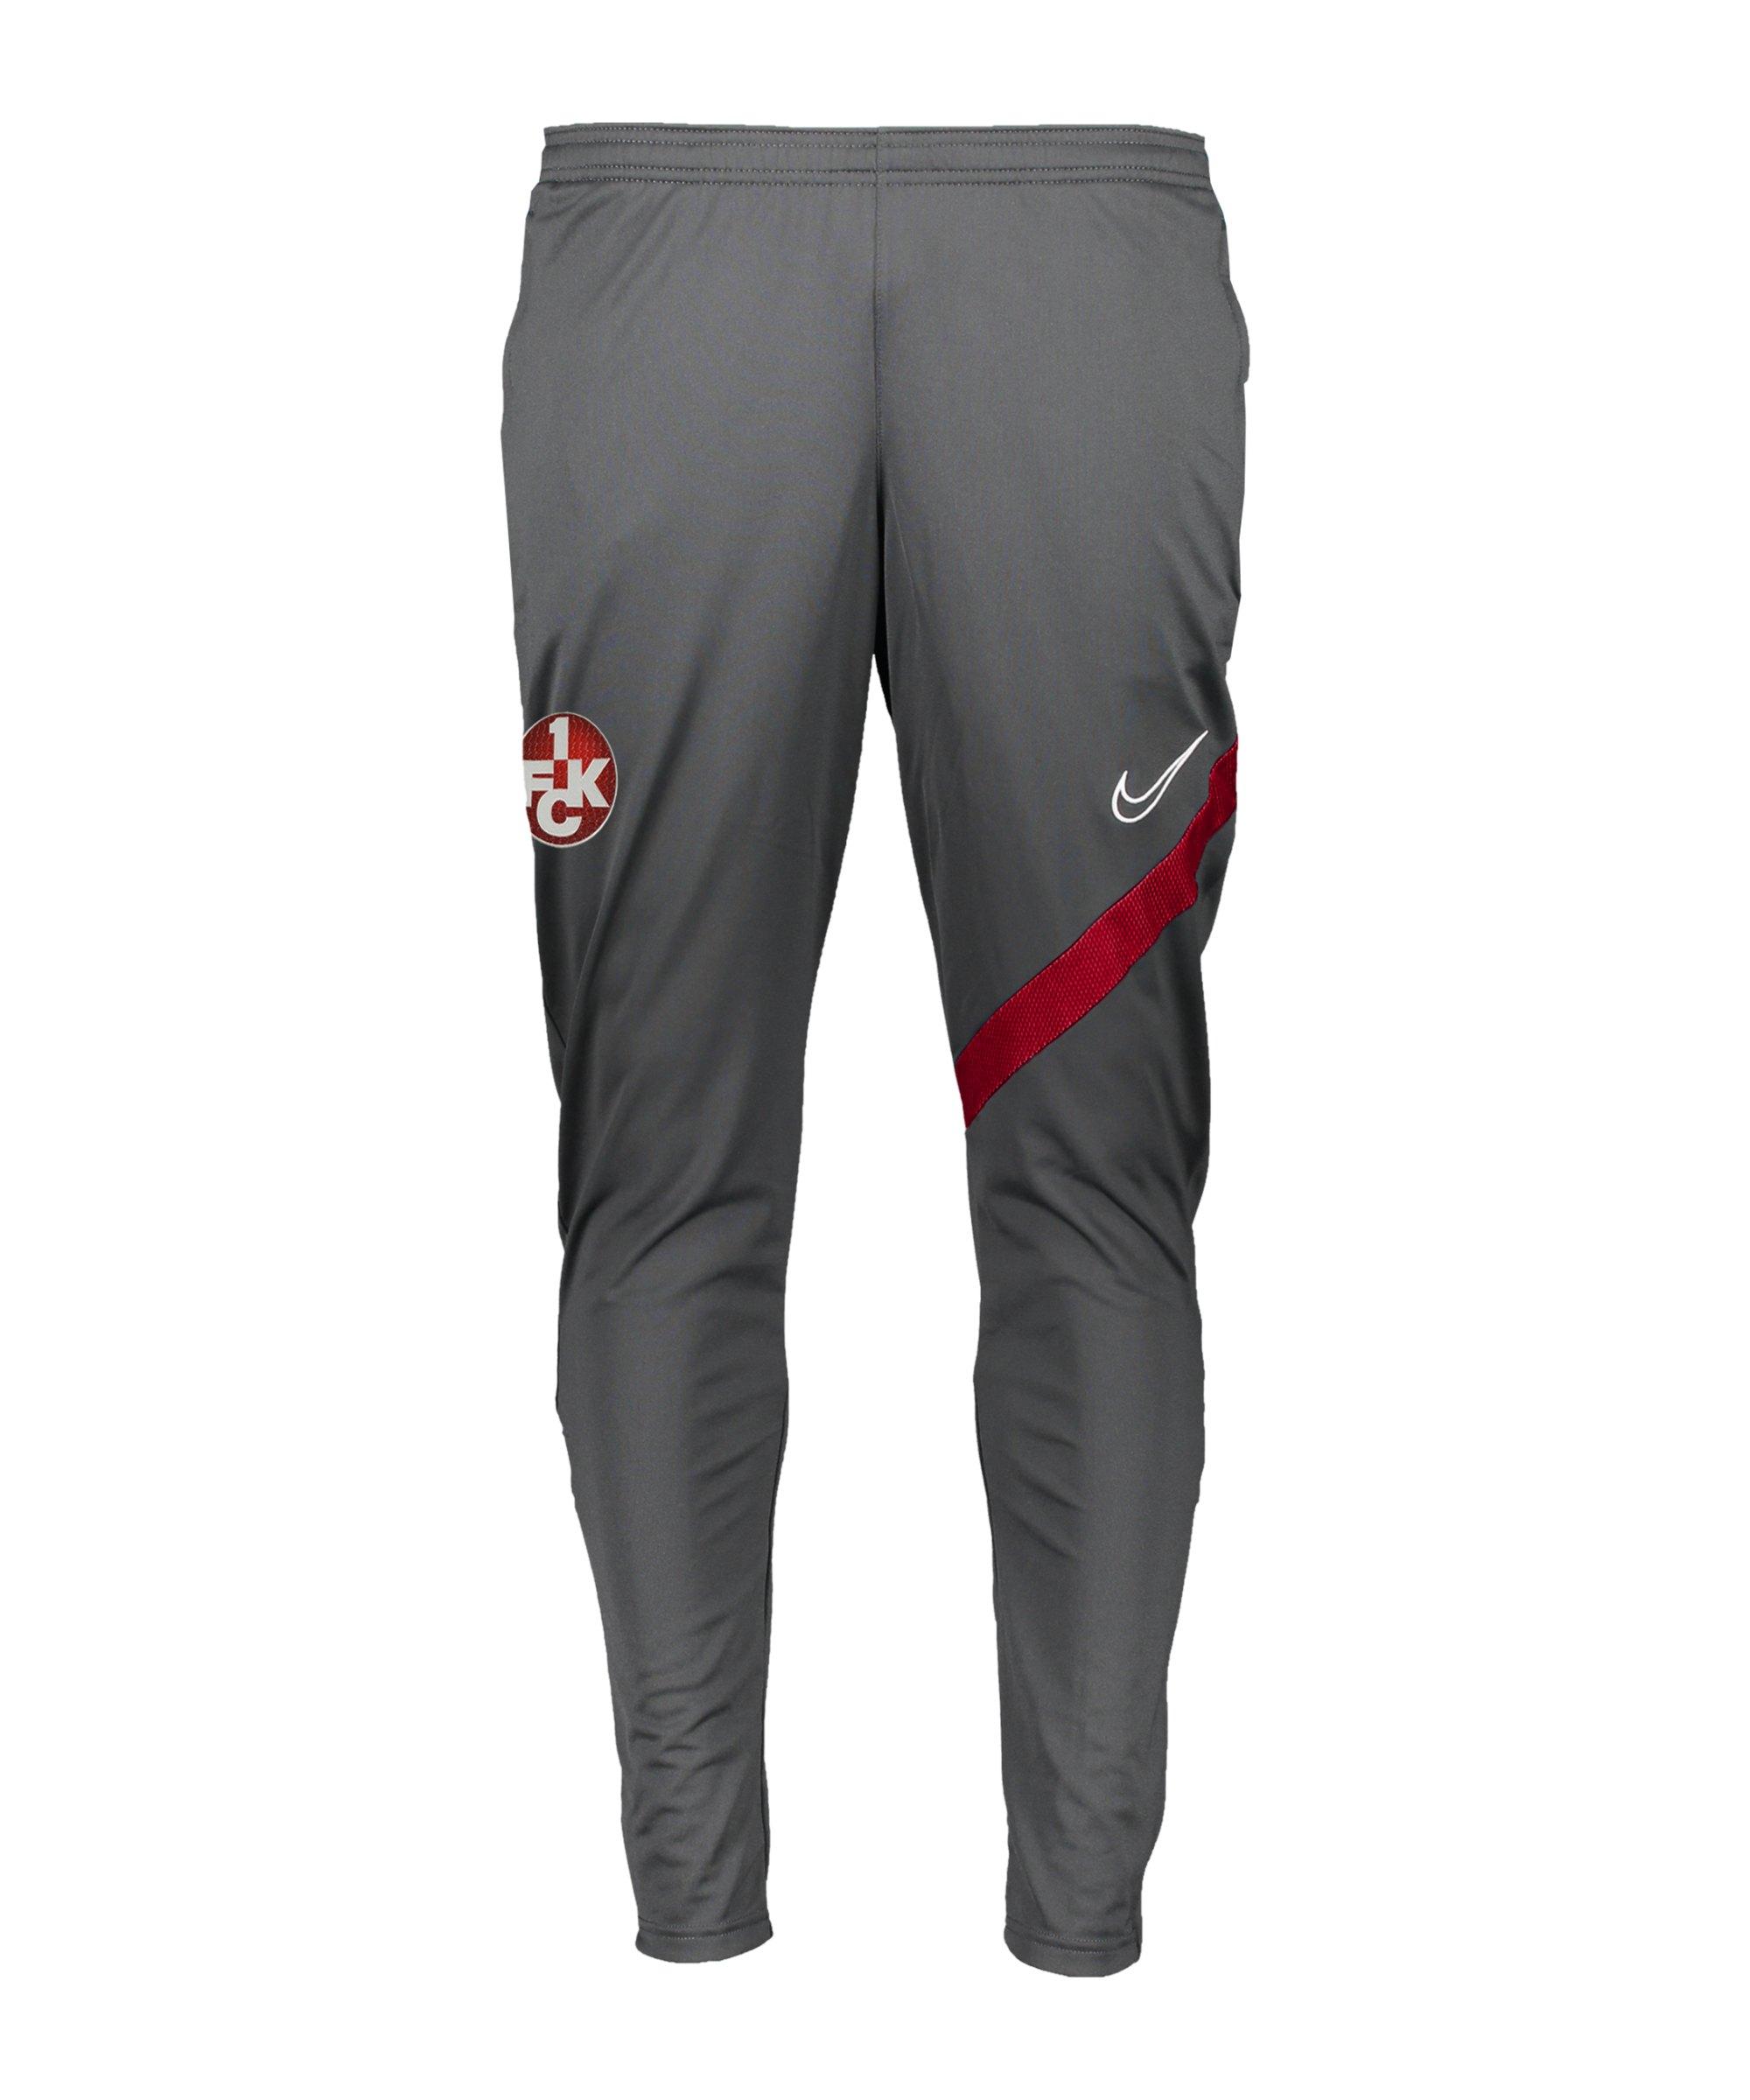 Nike 1. FC Kaiserslautern Hose F062 - grau